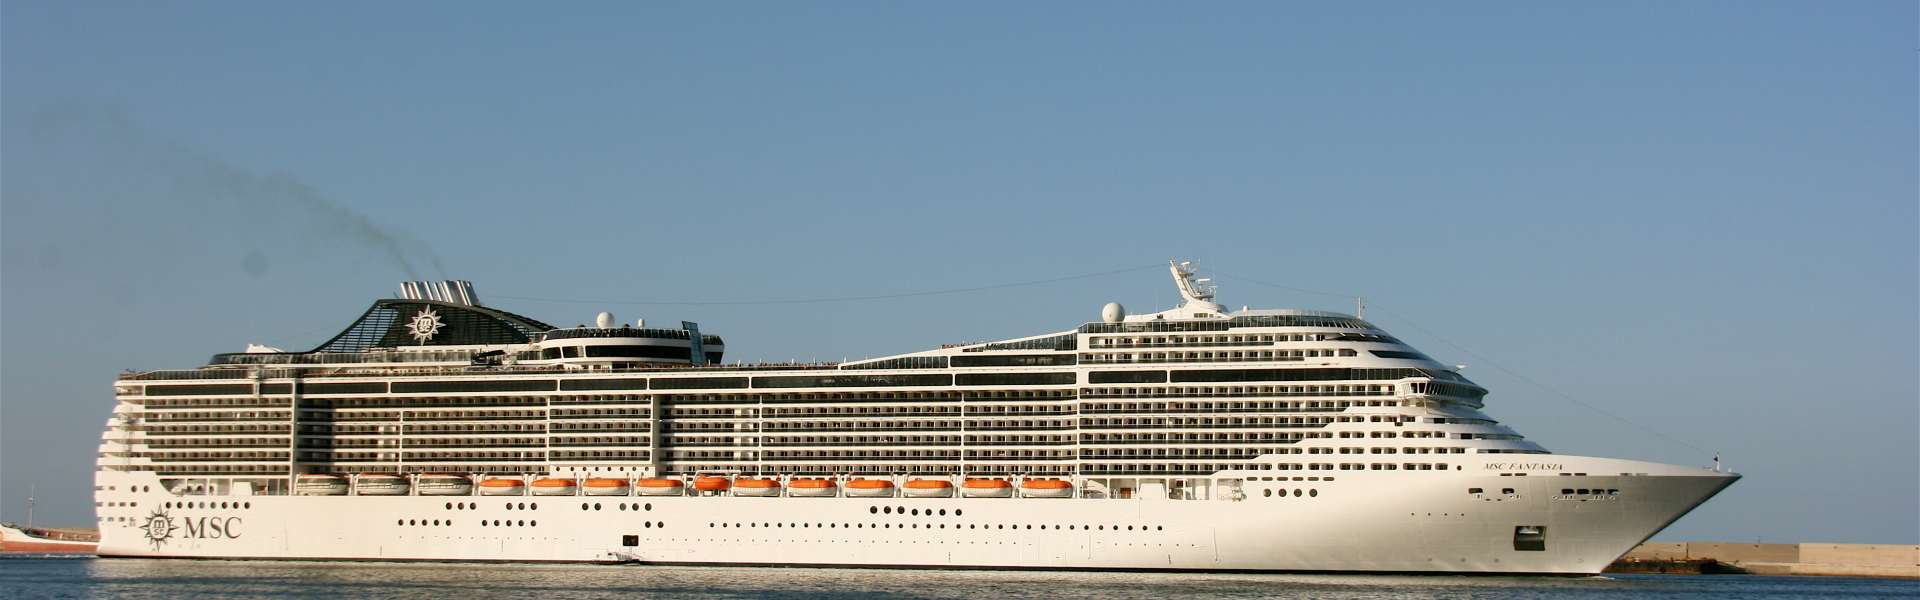 Croaziera 2019 - Mediterana de Vest (Palma de Mallorca) - MSC Cruises - MSC Fantasia - 7 nopti